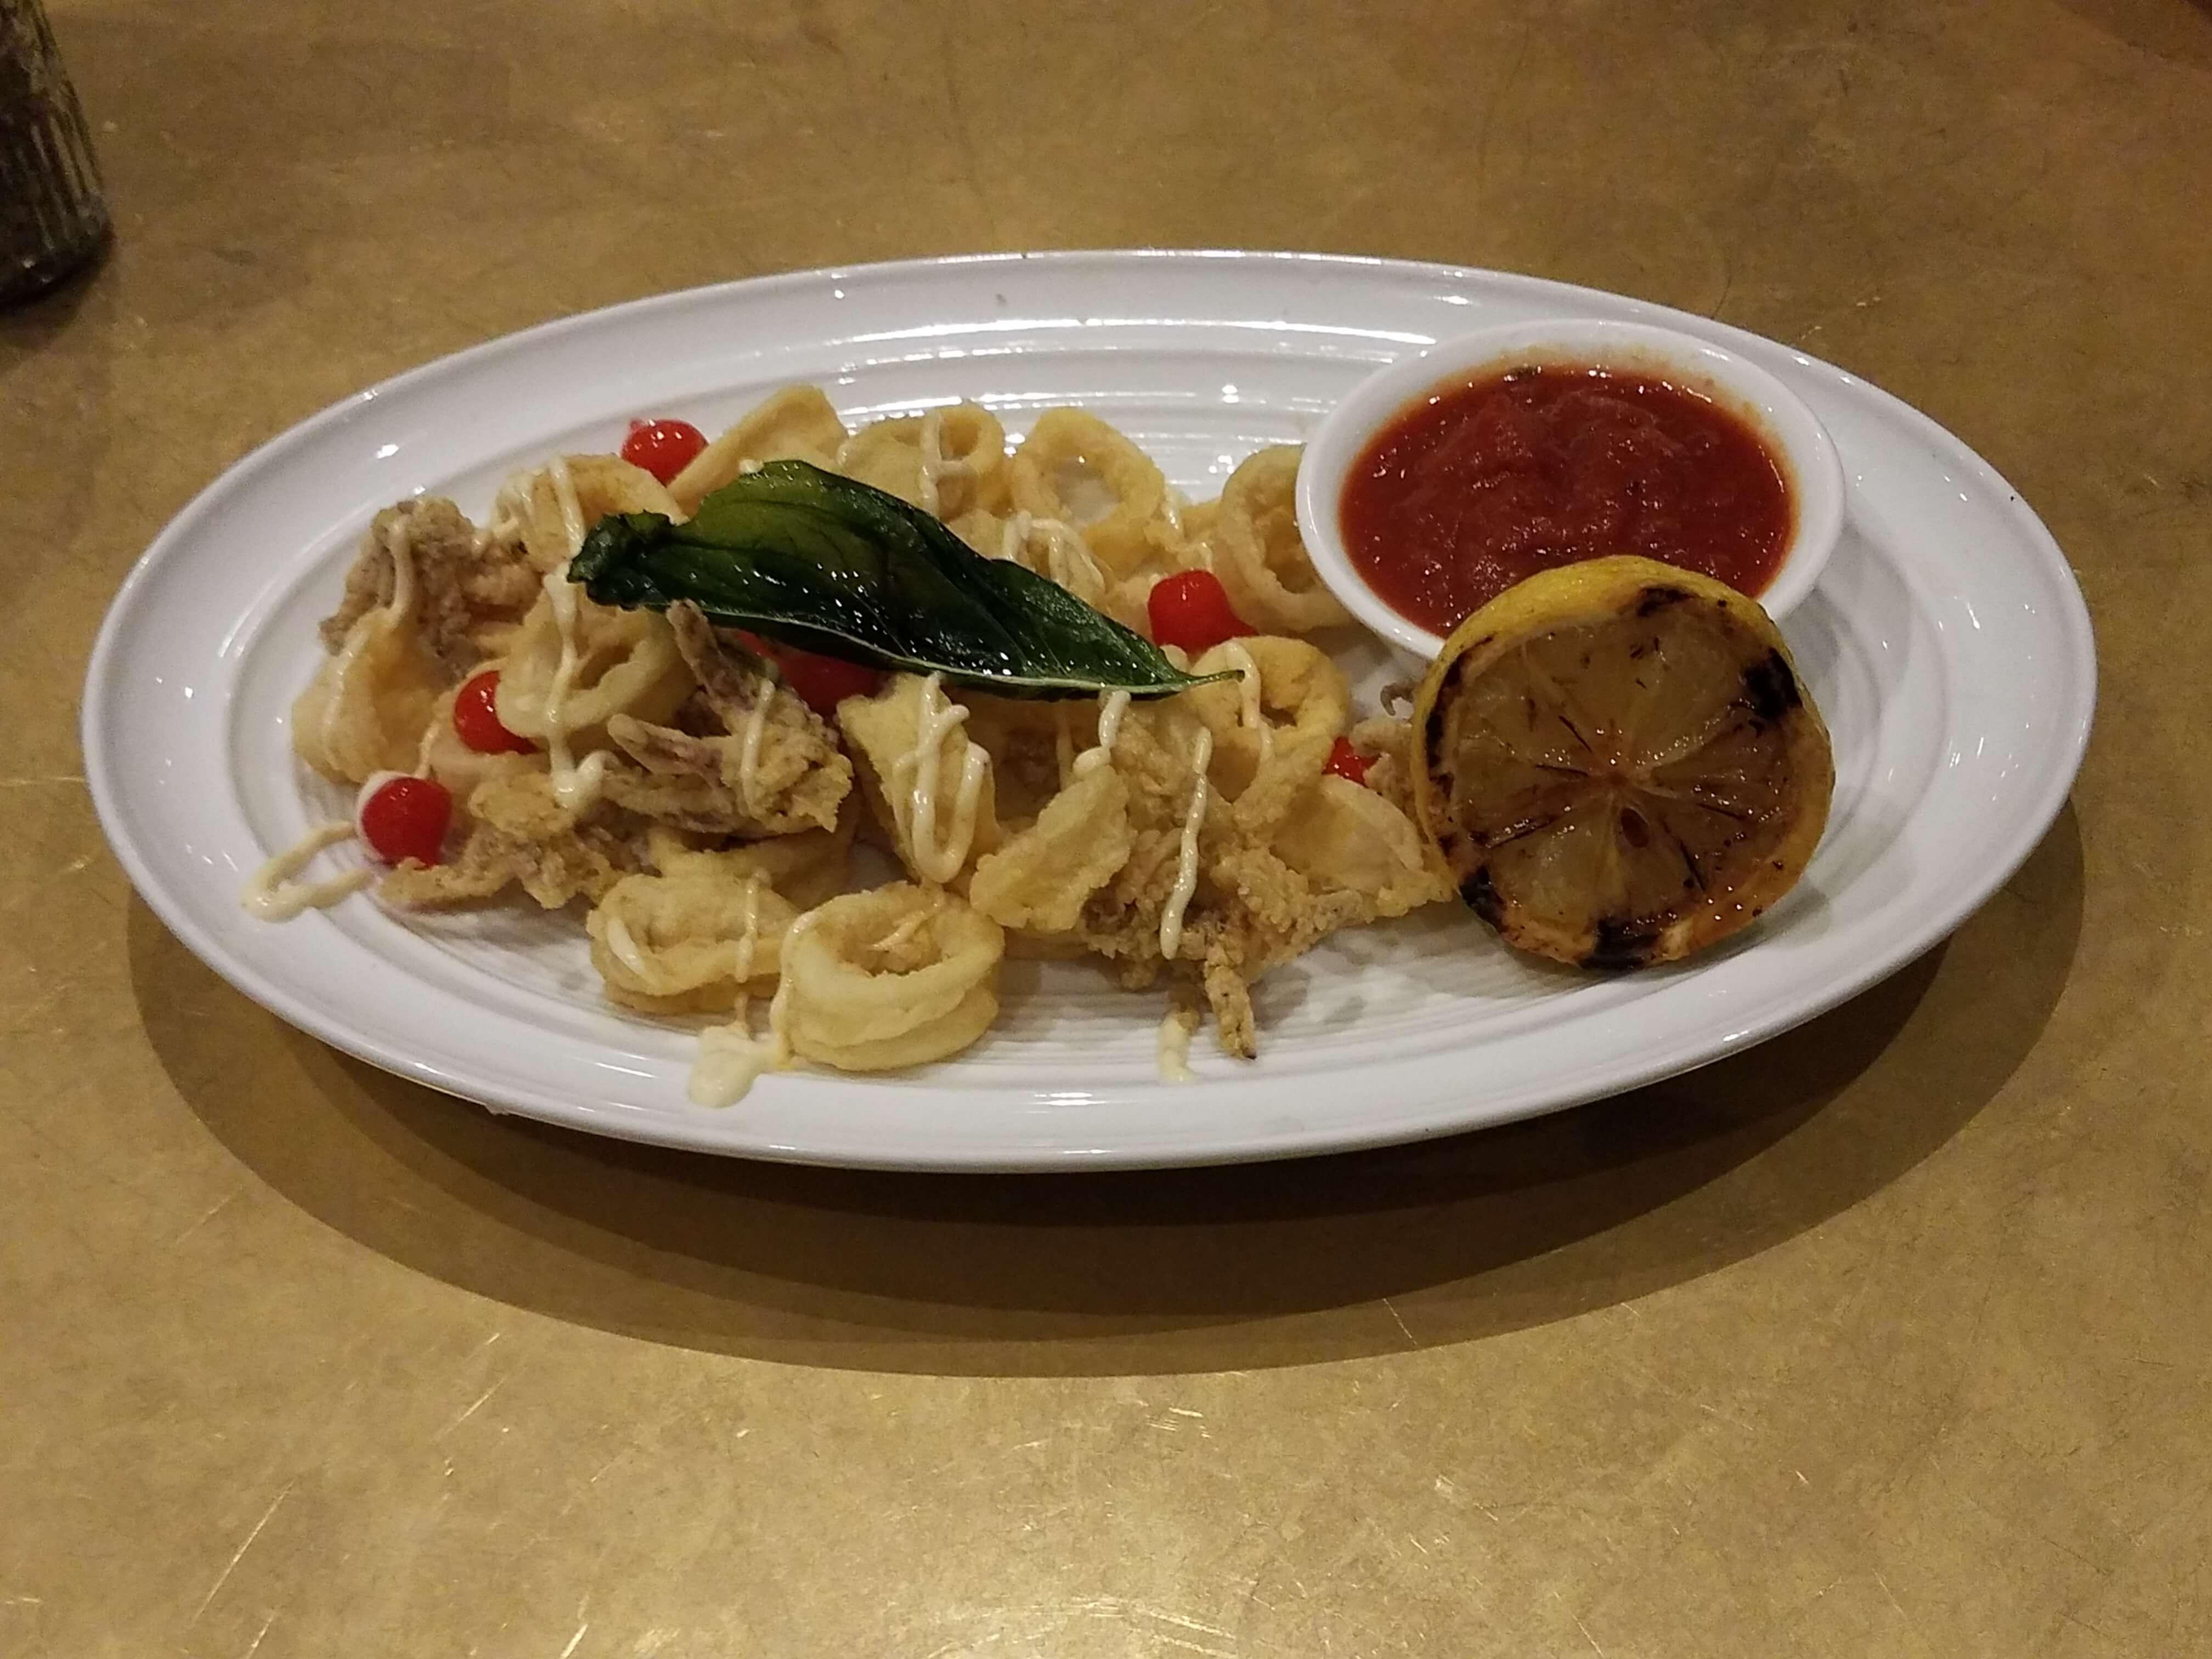 RestauranteVIVO Italian Kitchen da Universal CityWalk em Orlando